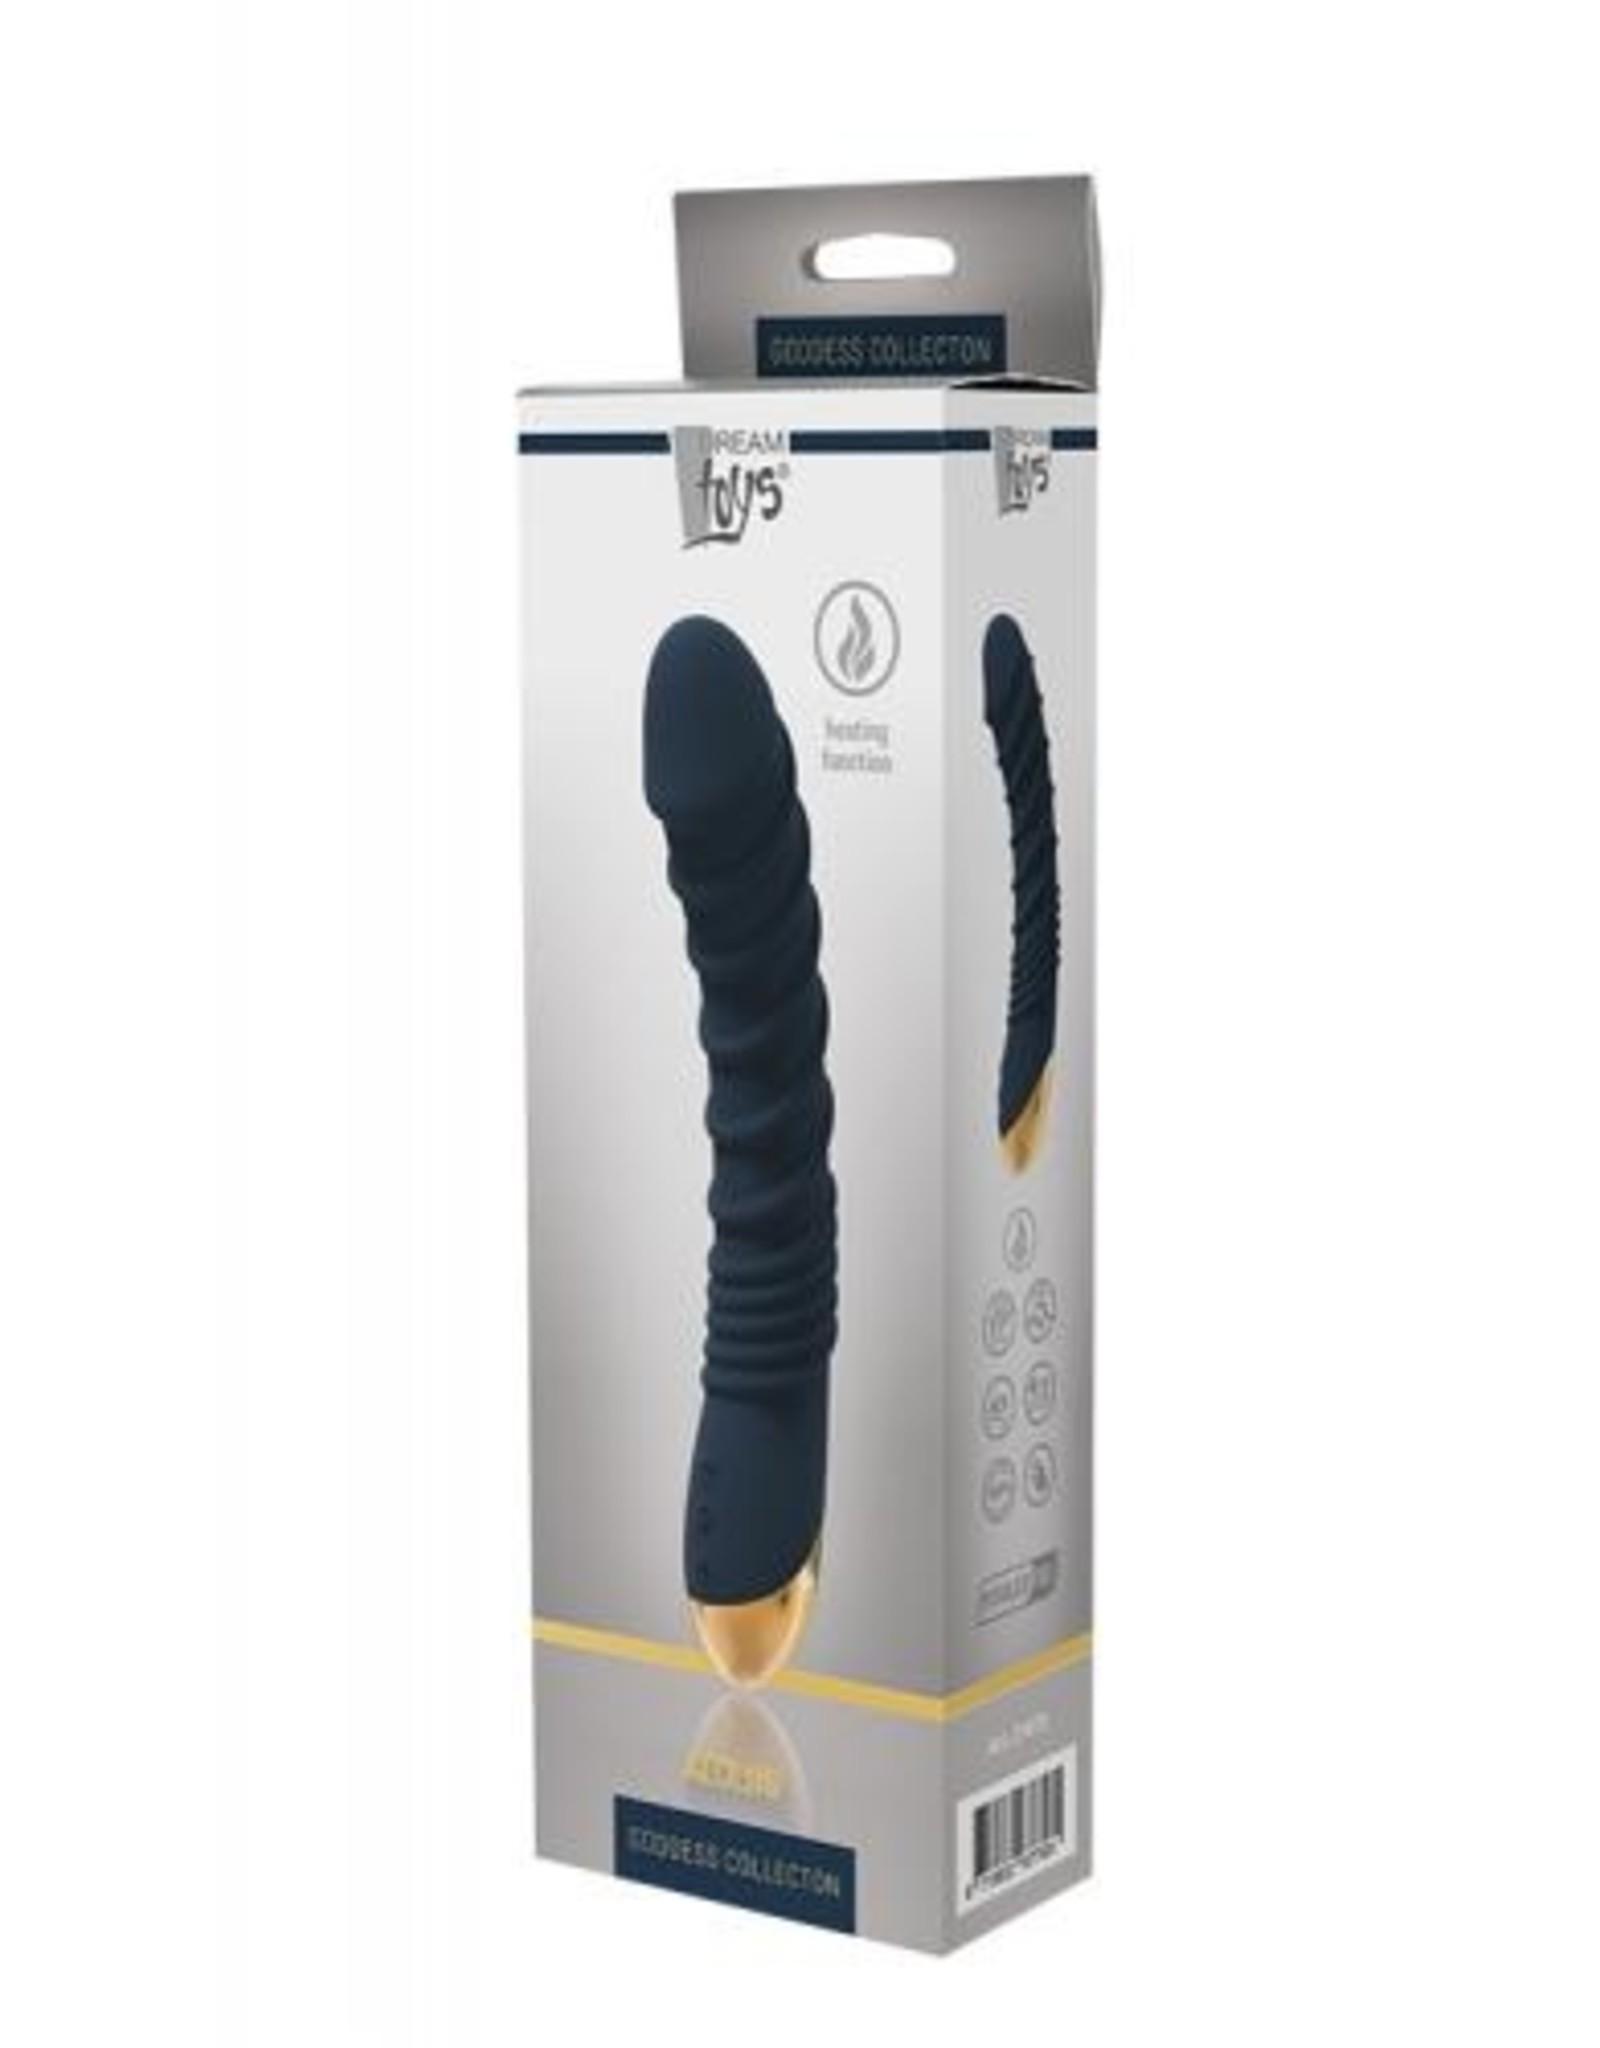 Goddess Collection Aeolus Verwarmende G-Spot Vibrator